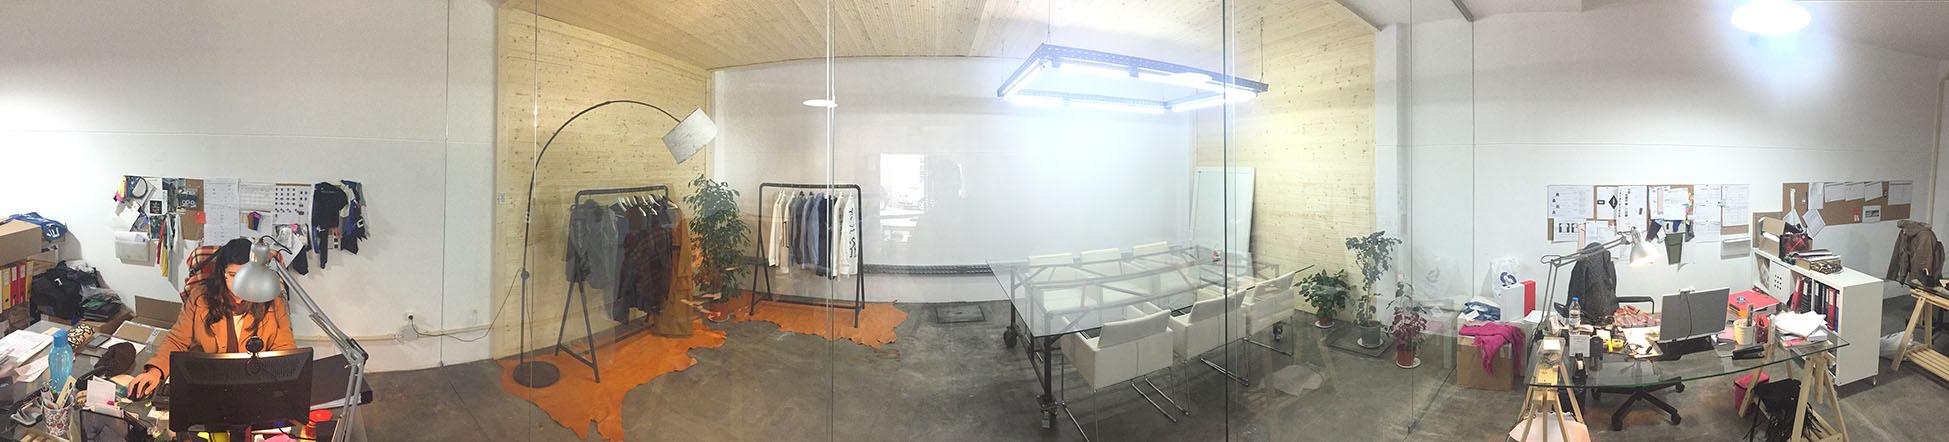 office14